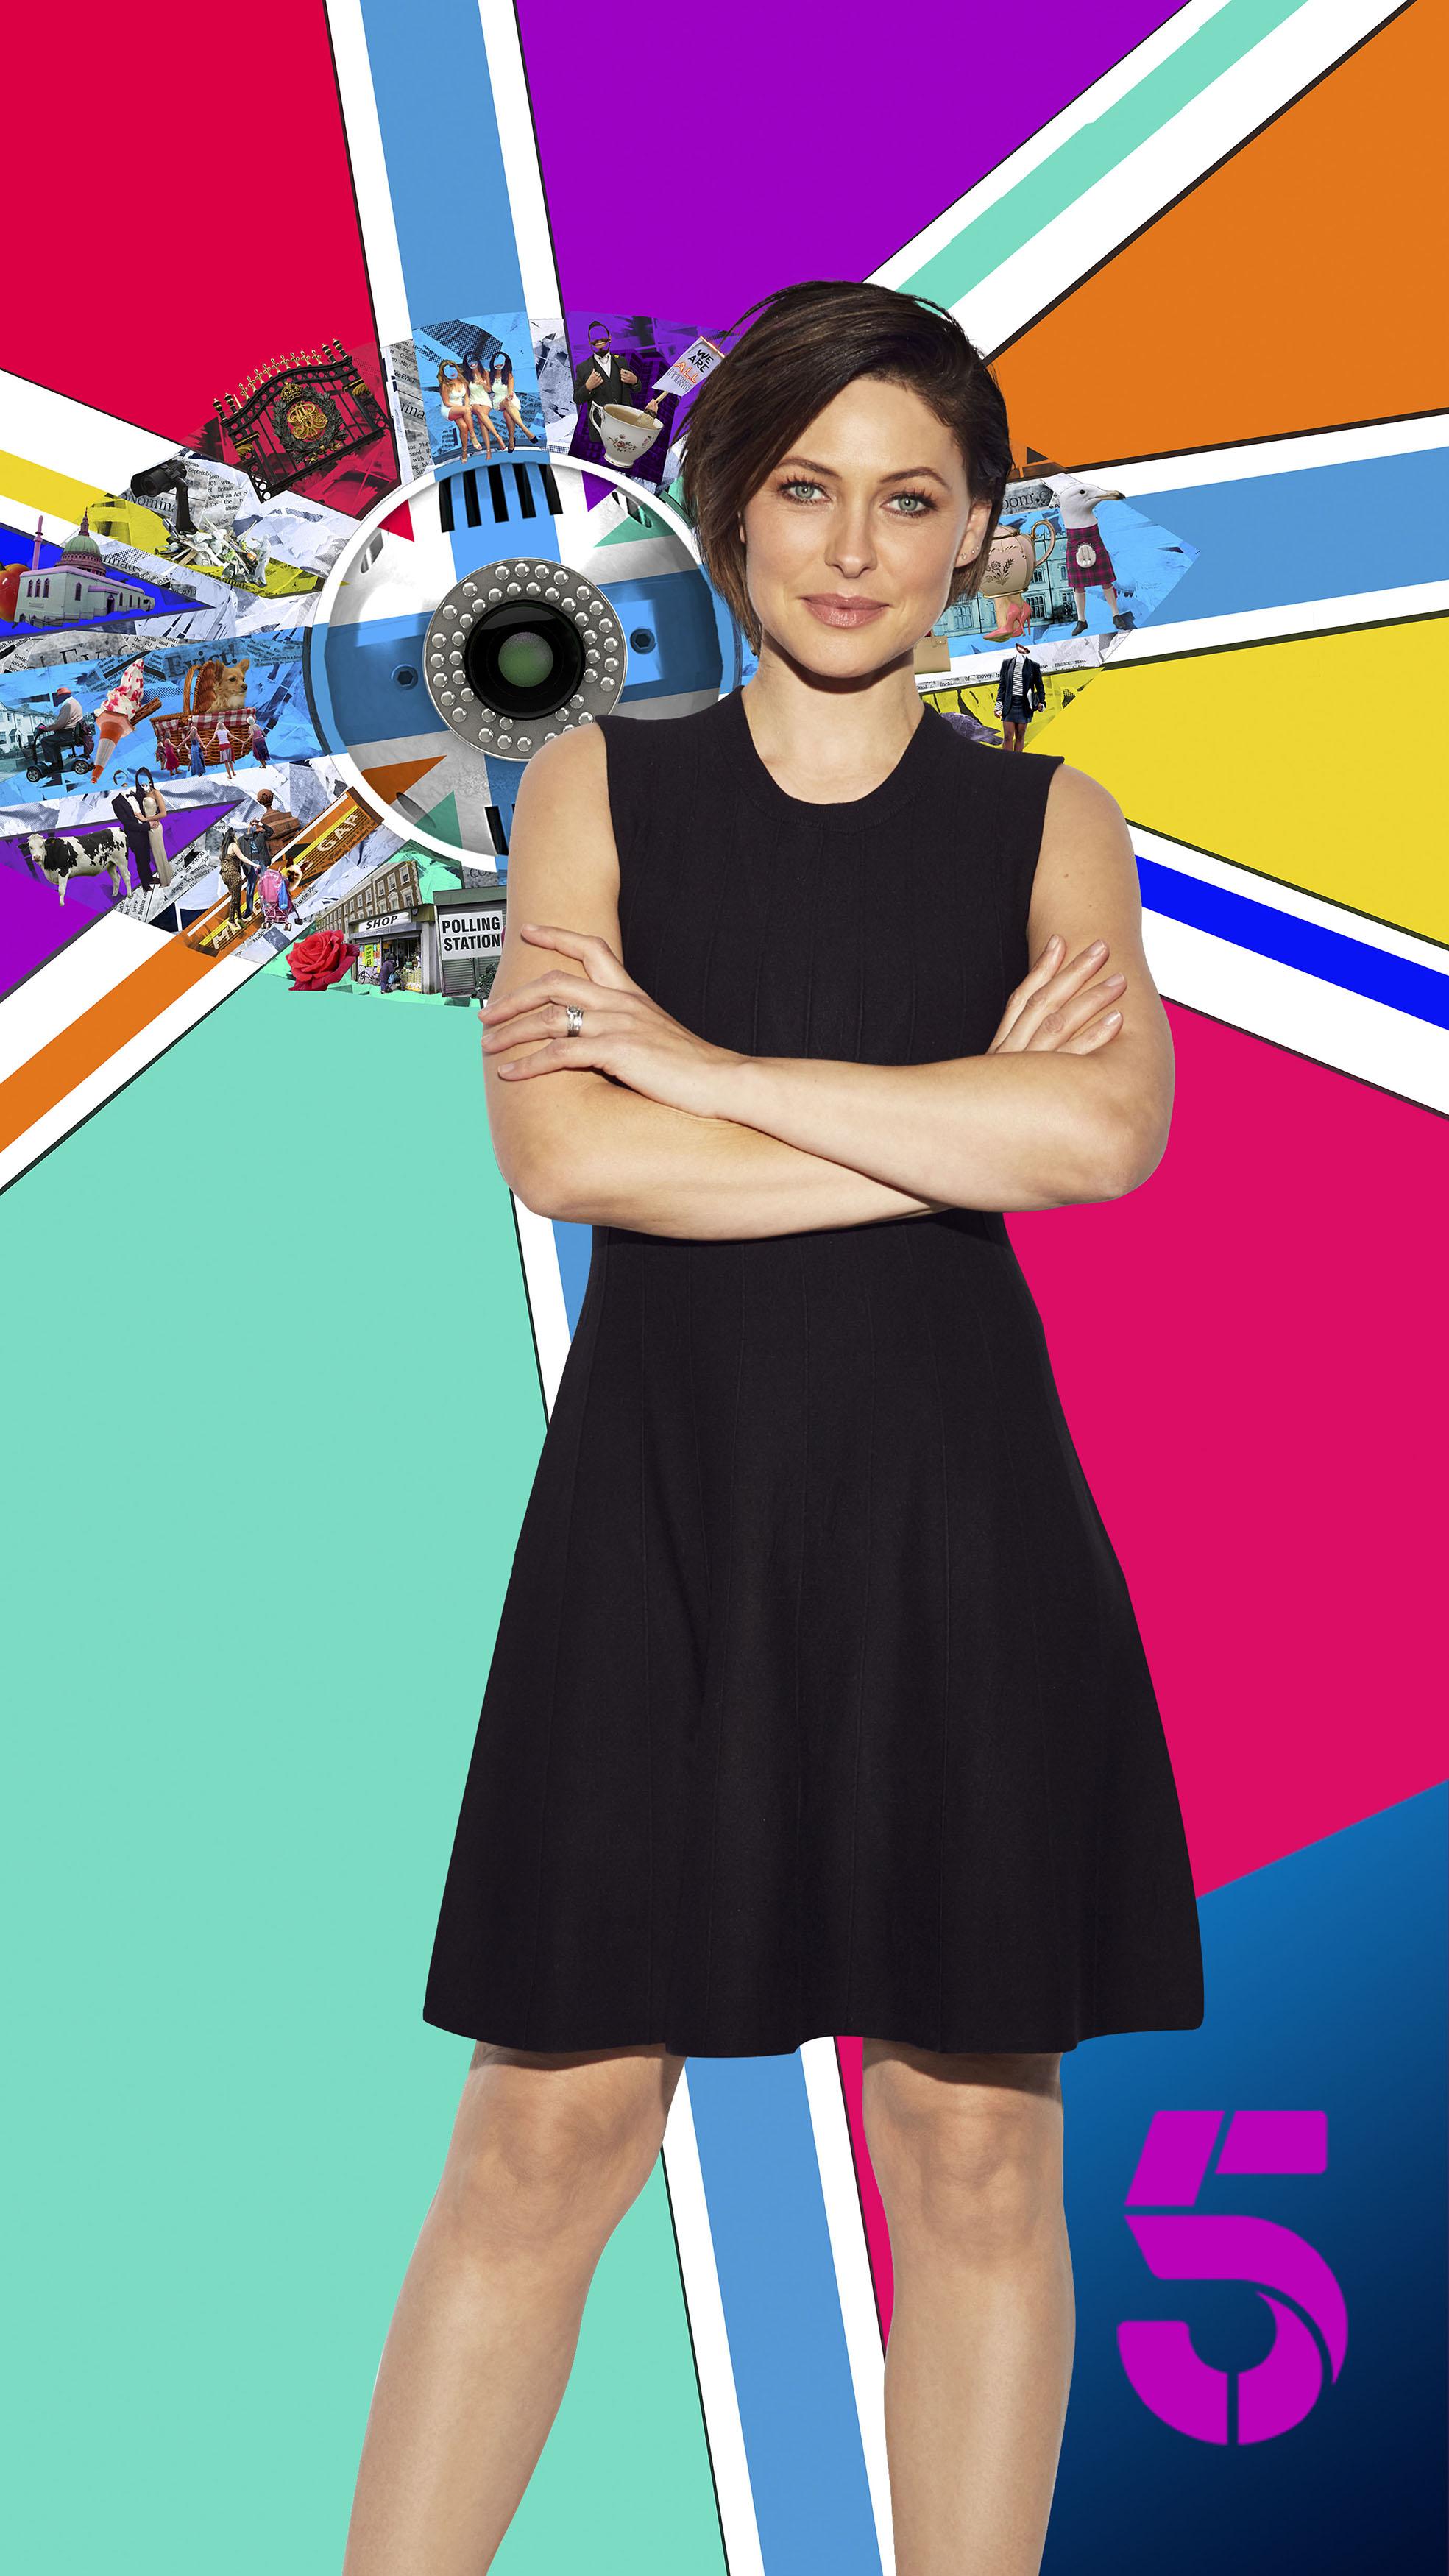 Big Brother image